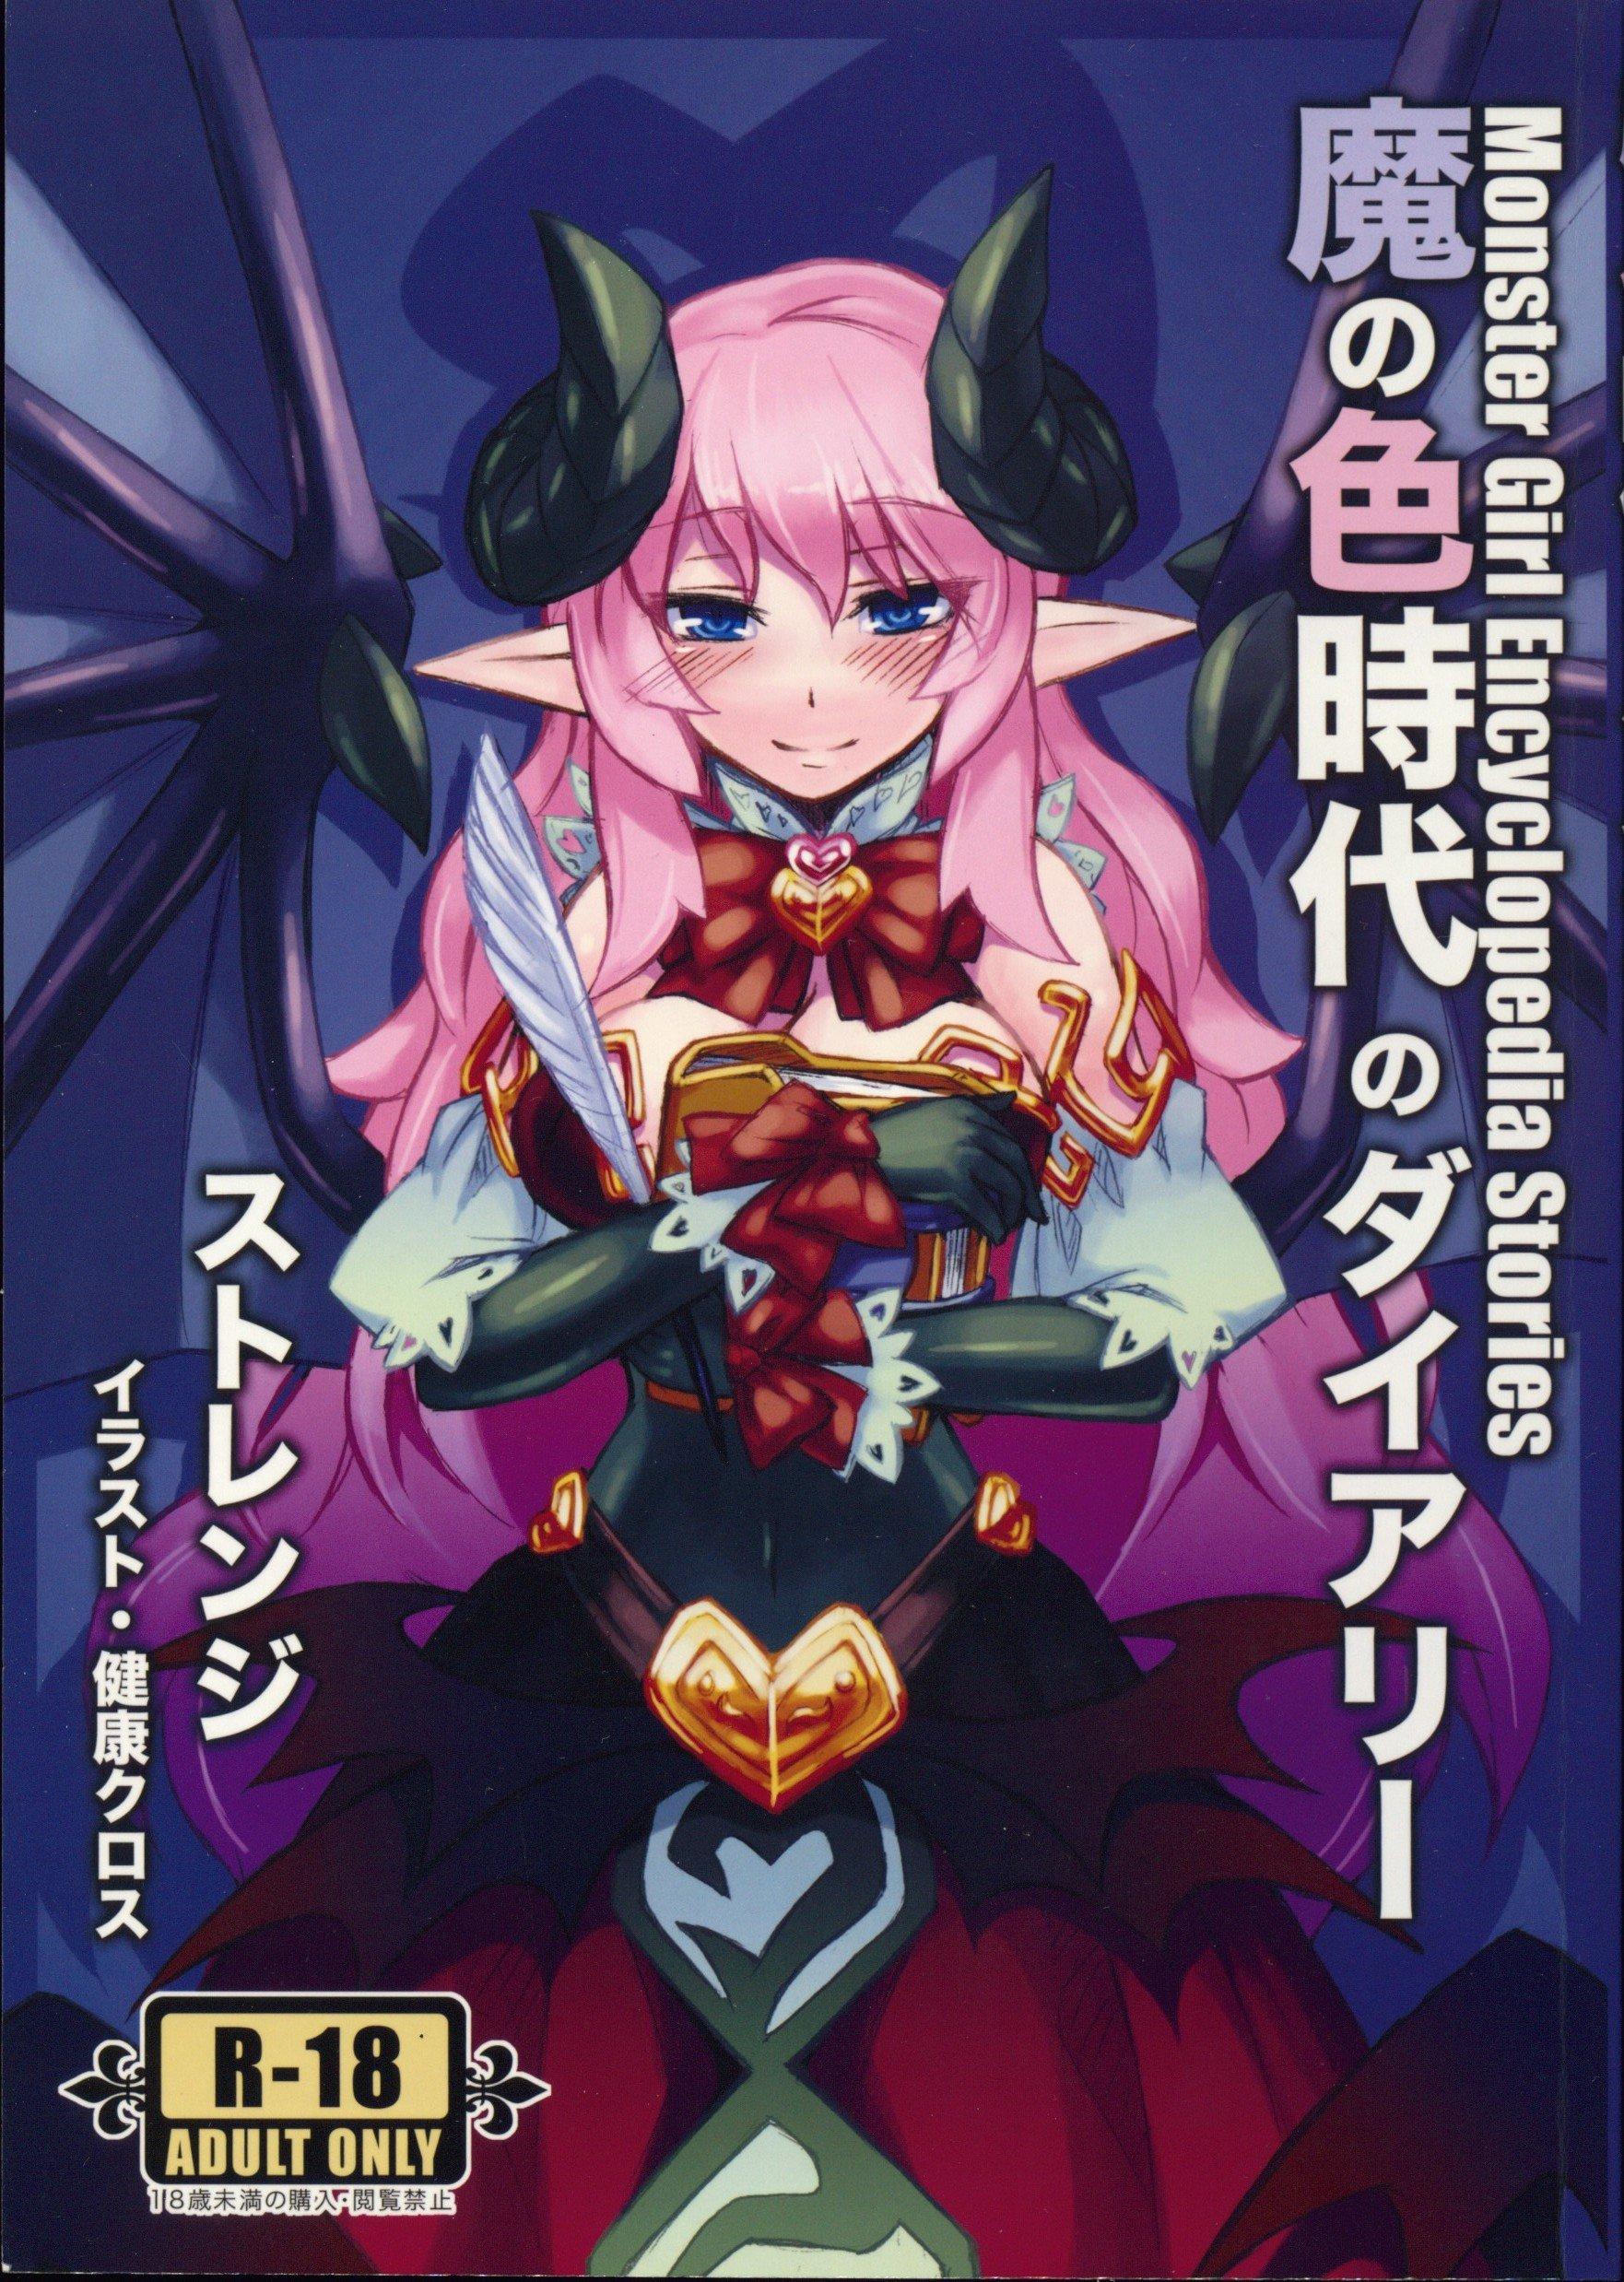 Monster Girl Encyclopedia Stories: Diary of the Age of Monster Love | Monster Girl Encyclopedia